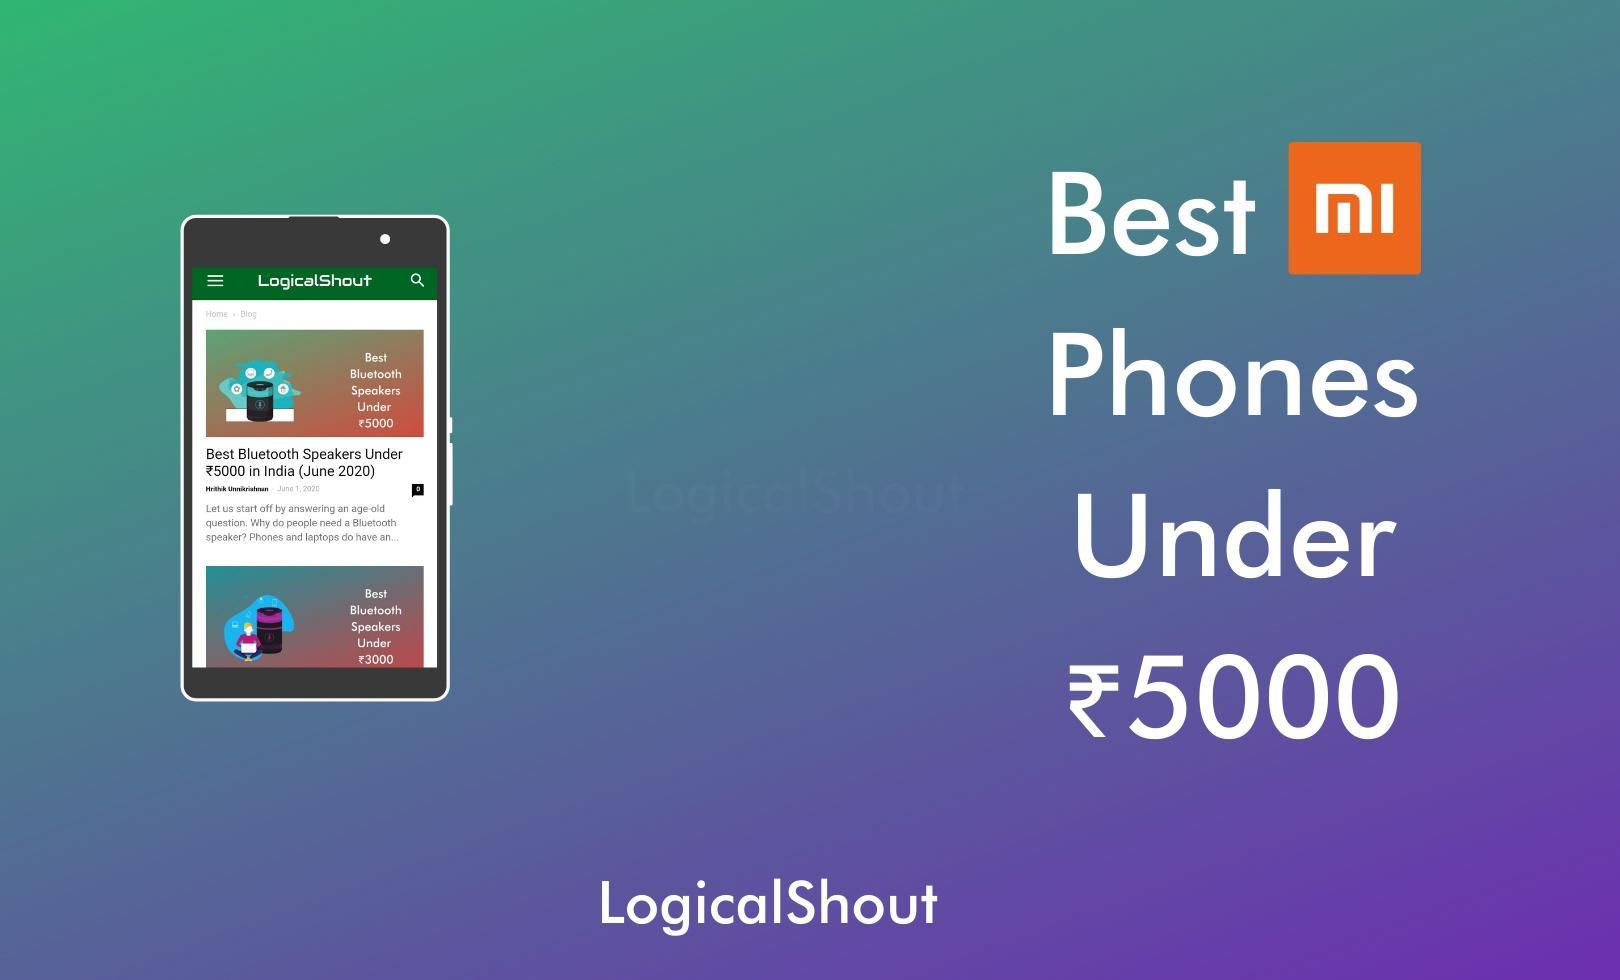 Best Mi Phones Under 5000